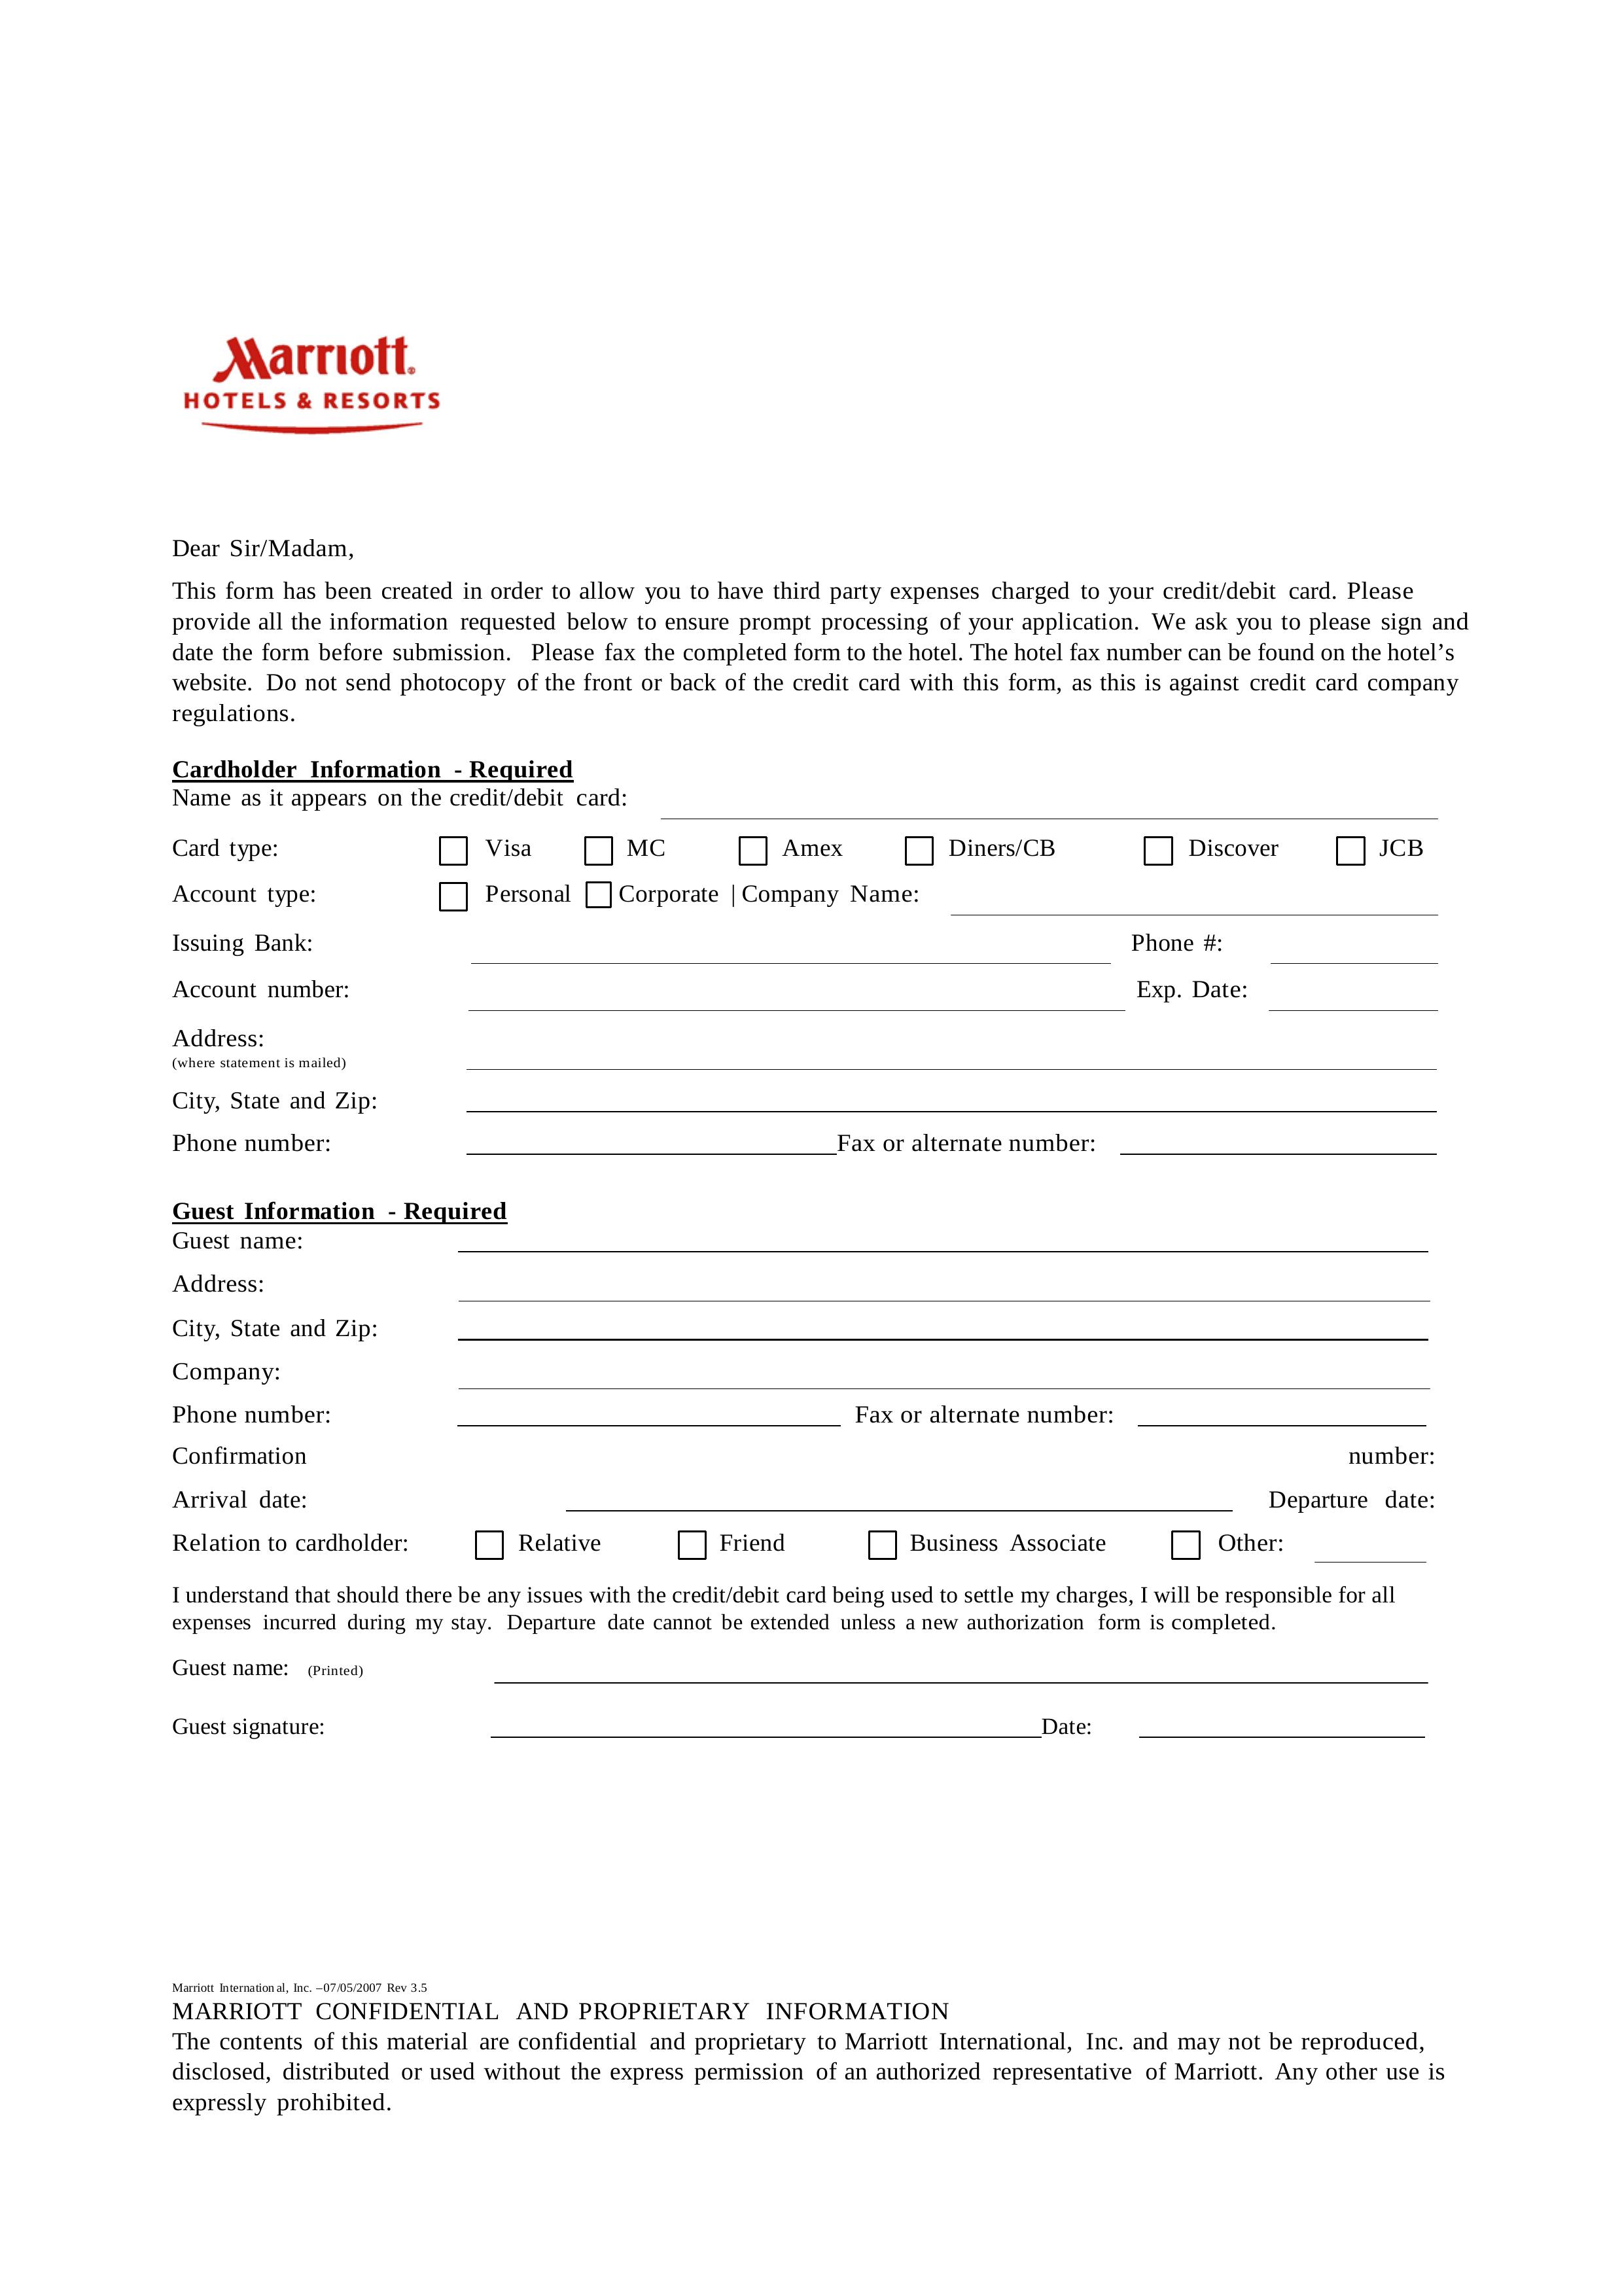 Free Marriott Credit Card Authorization Form Pdf Eforms